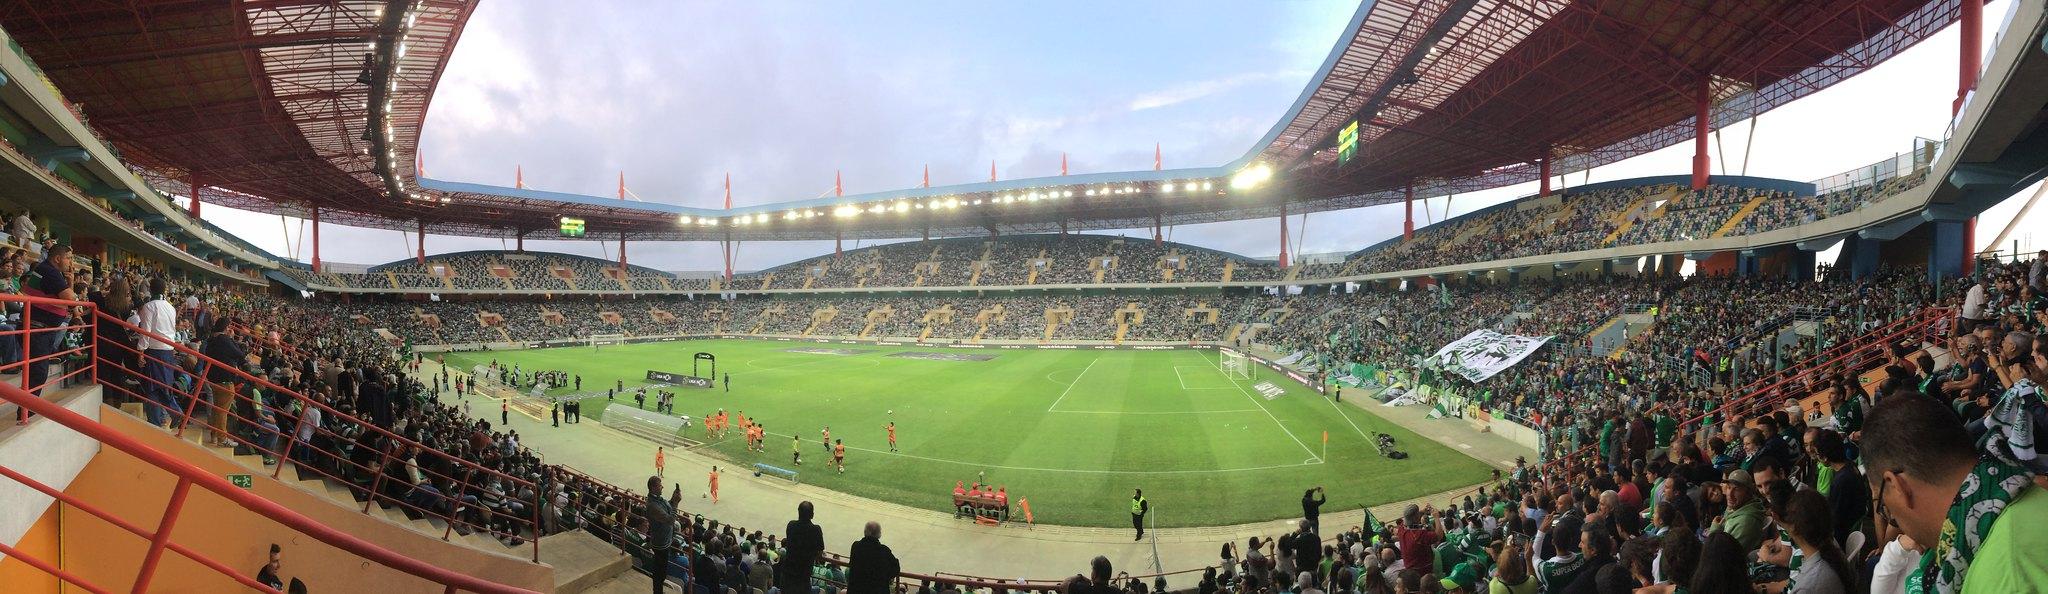 Panorama Estádio Municipal de Aveiro, CD Tondela x Sporting CP